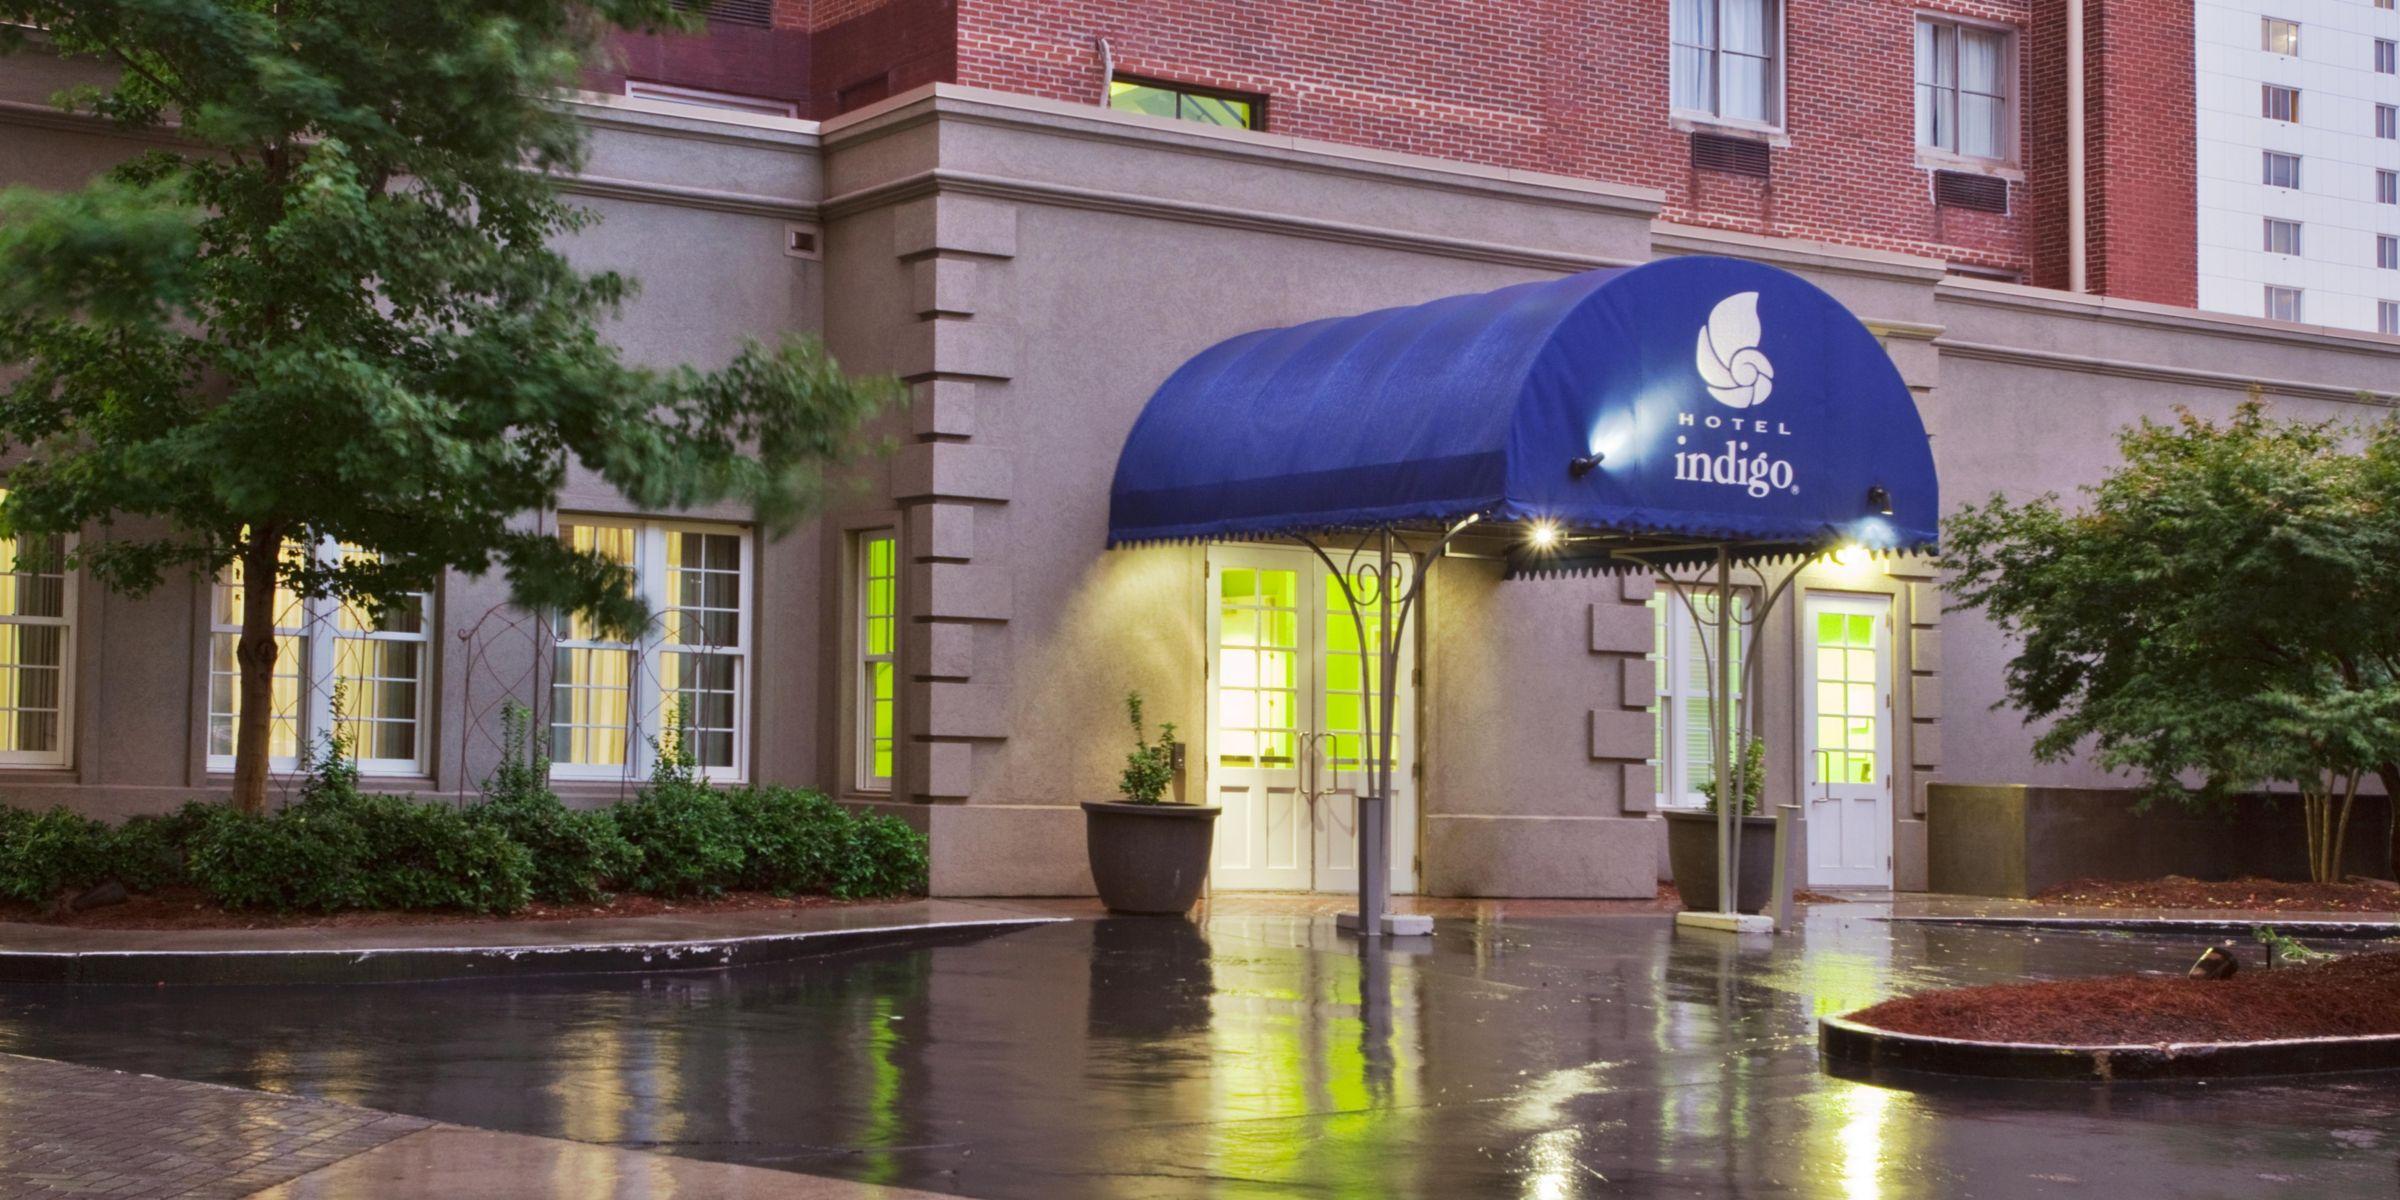 Hotel Indigo Atlanta Midtown The World S First